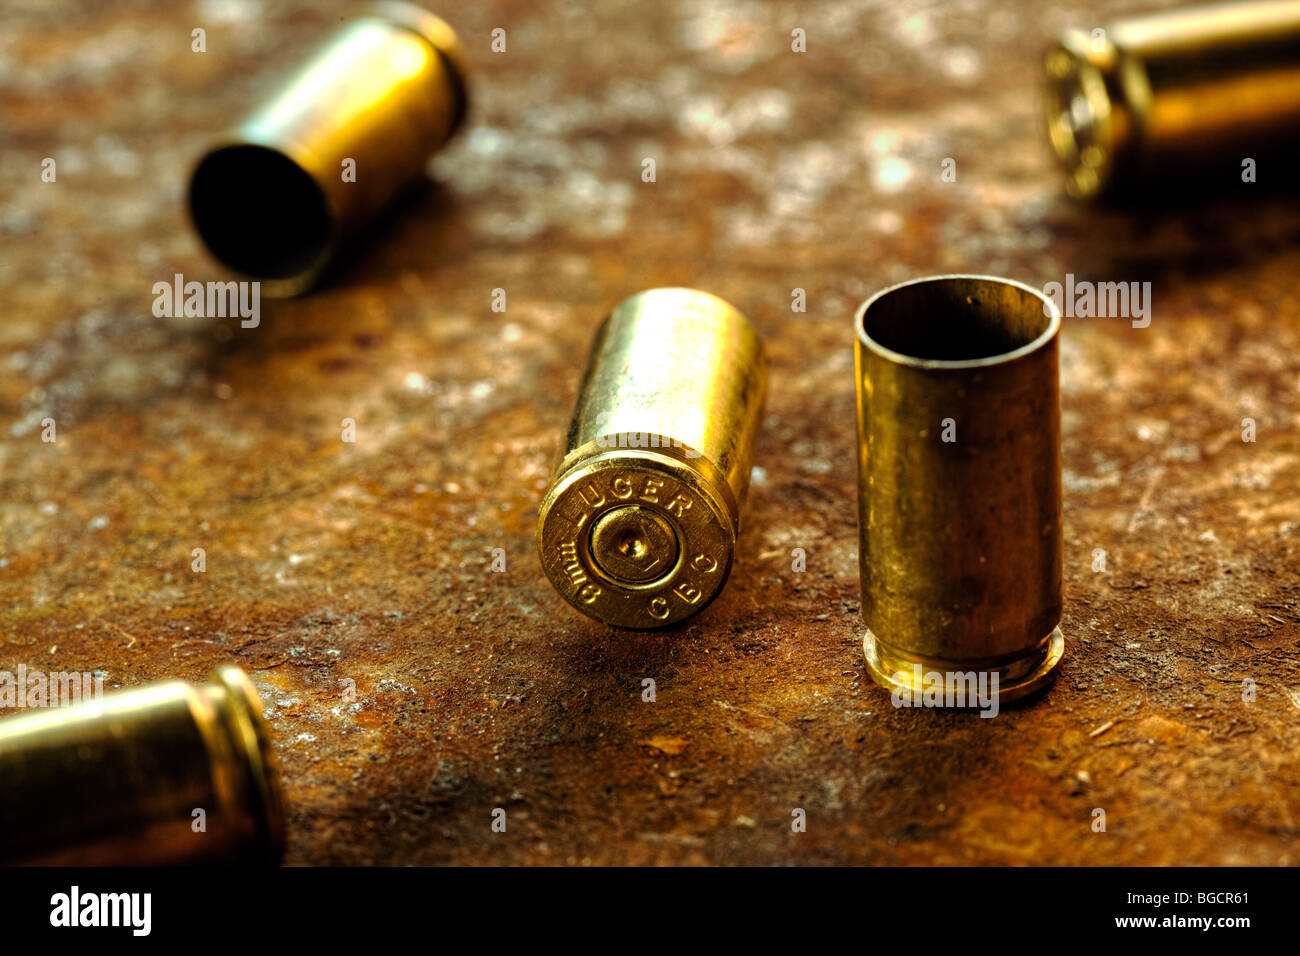 9mm cartridge casings - Stock Image